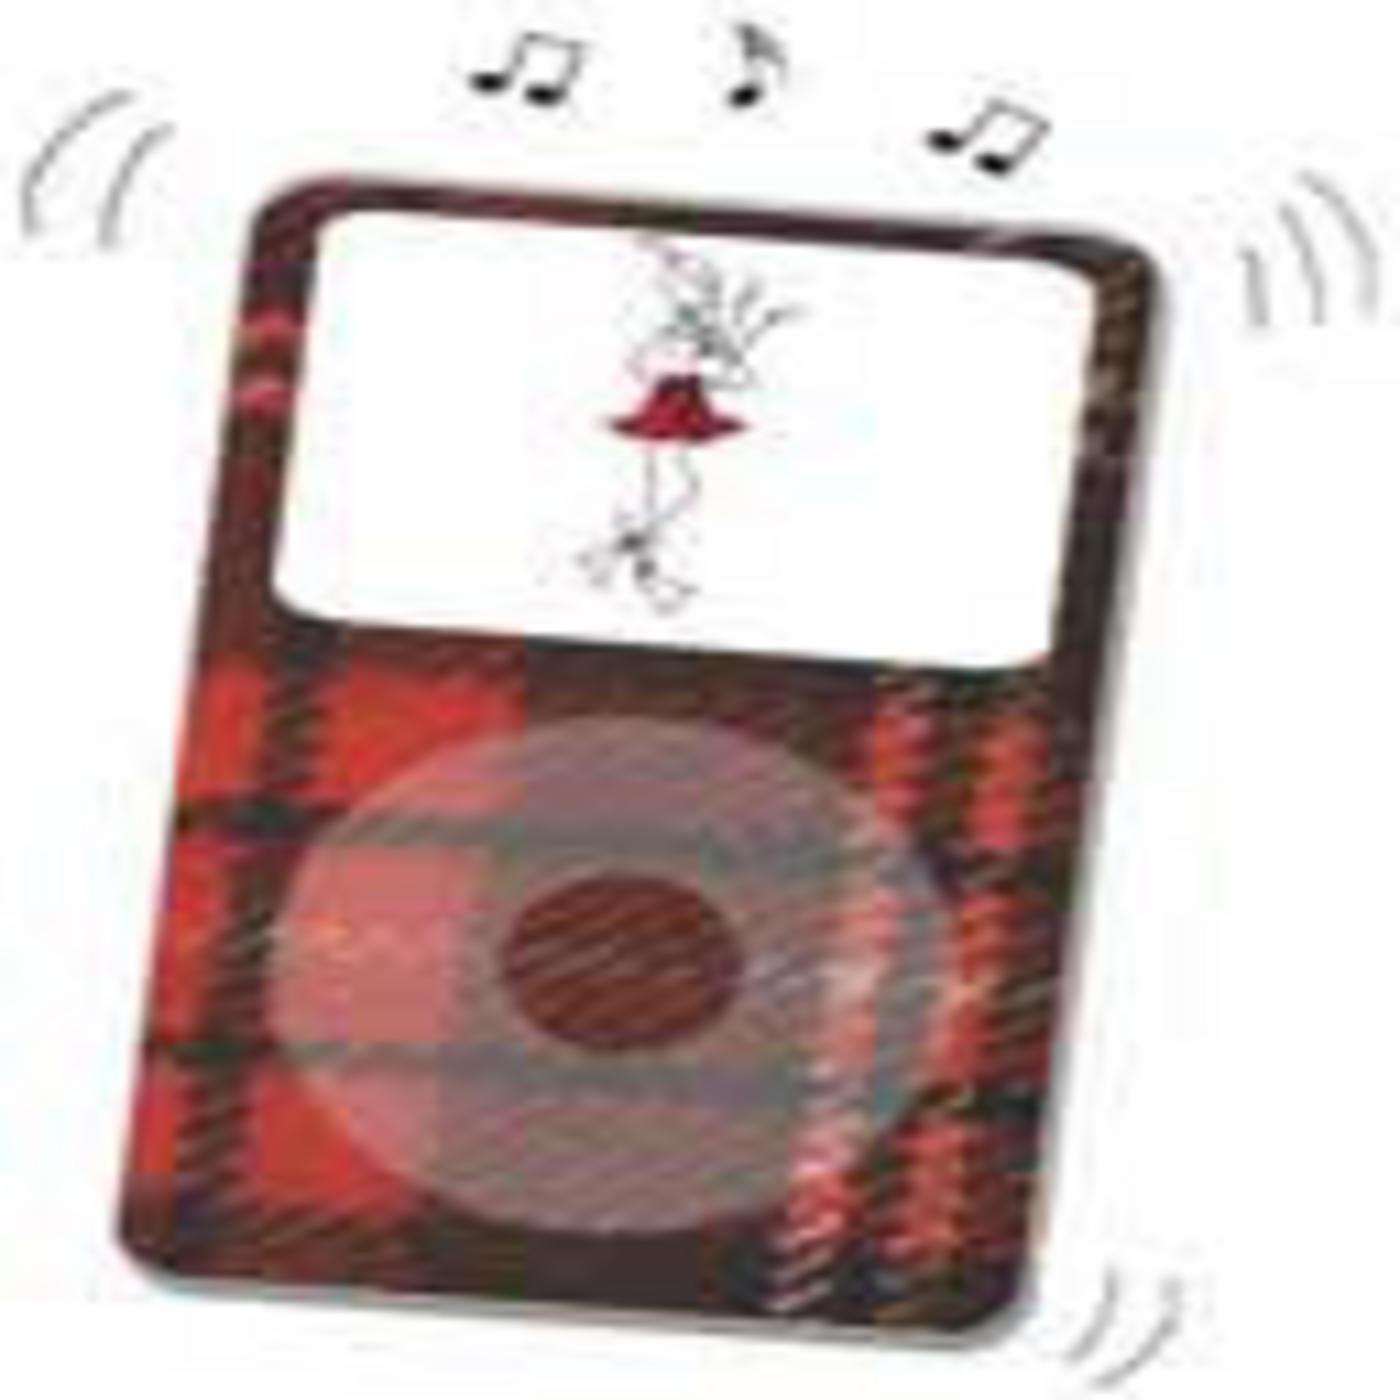 AyePodcast 139 - Scottish Music Podcast